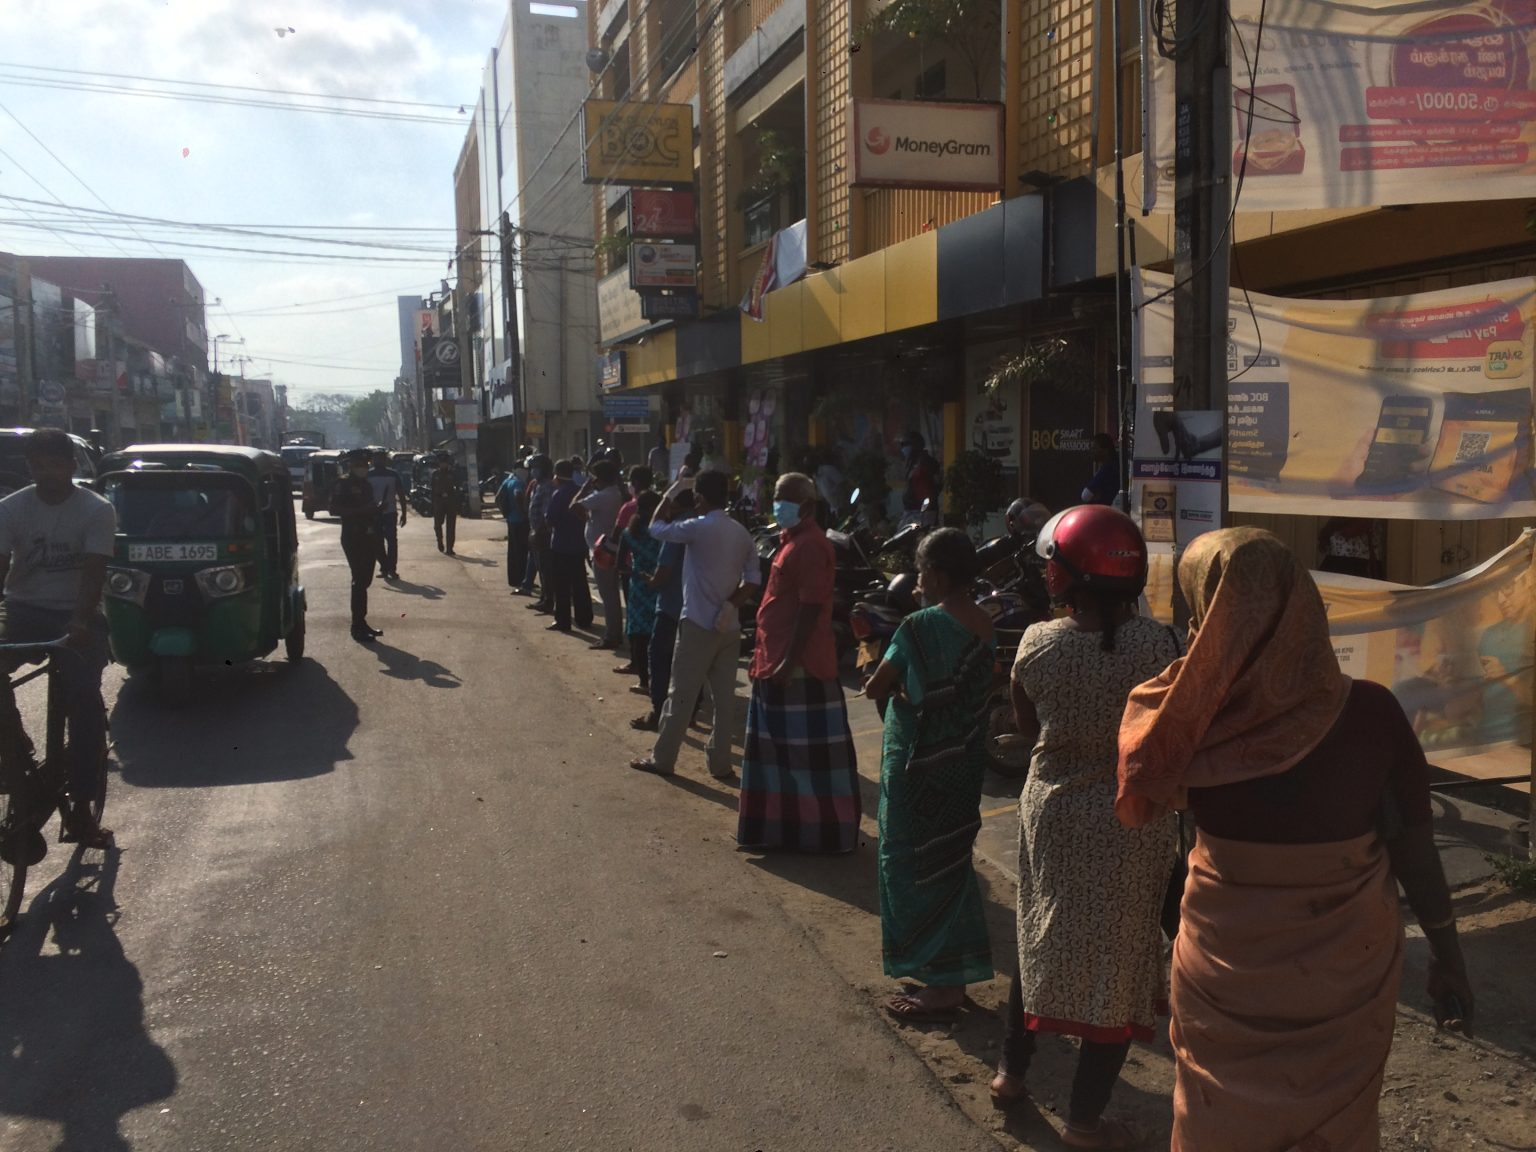 Curfew-Release-Time-Jaffna-Situation-Coronavirus-Alert-Situation-13-1536x1152